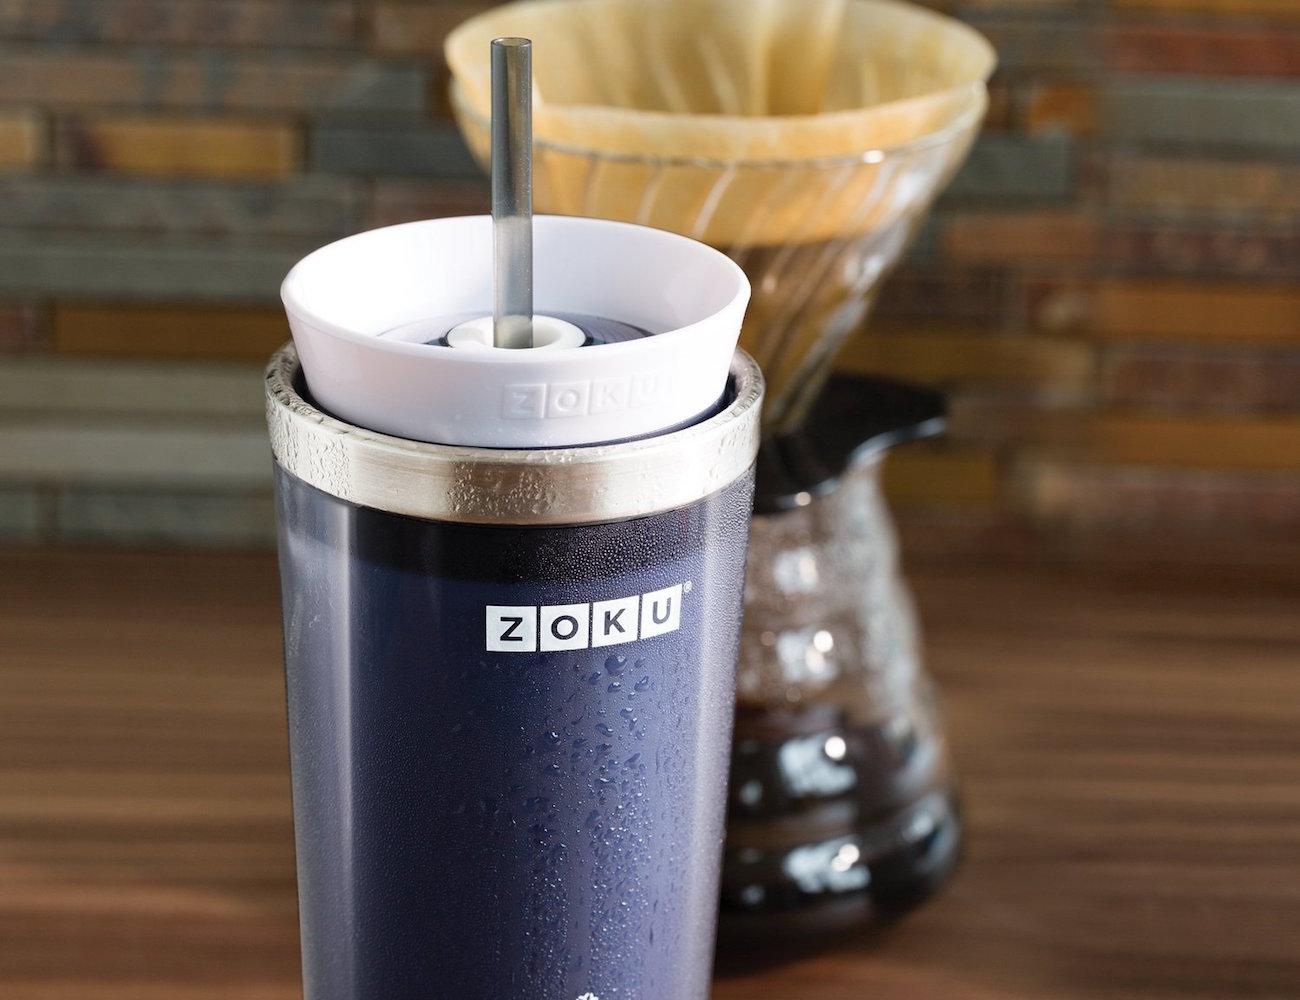 zoku-iced-coffee-maker-travel-mug-03